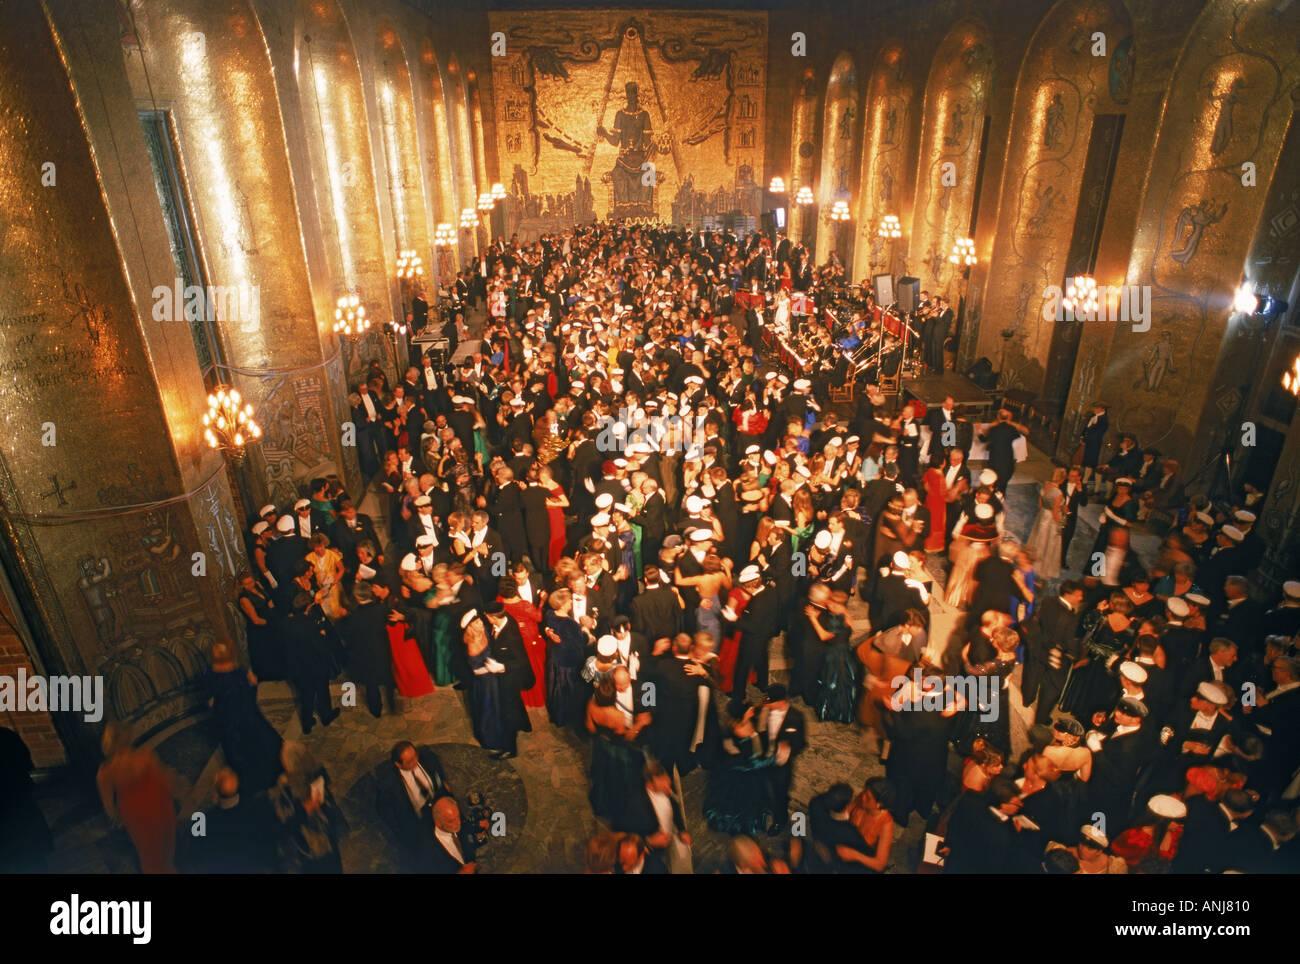 Tanzen in goldene Saal im Rathaus der Stadt Stockholm während Nobel Awards Stockbild